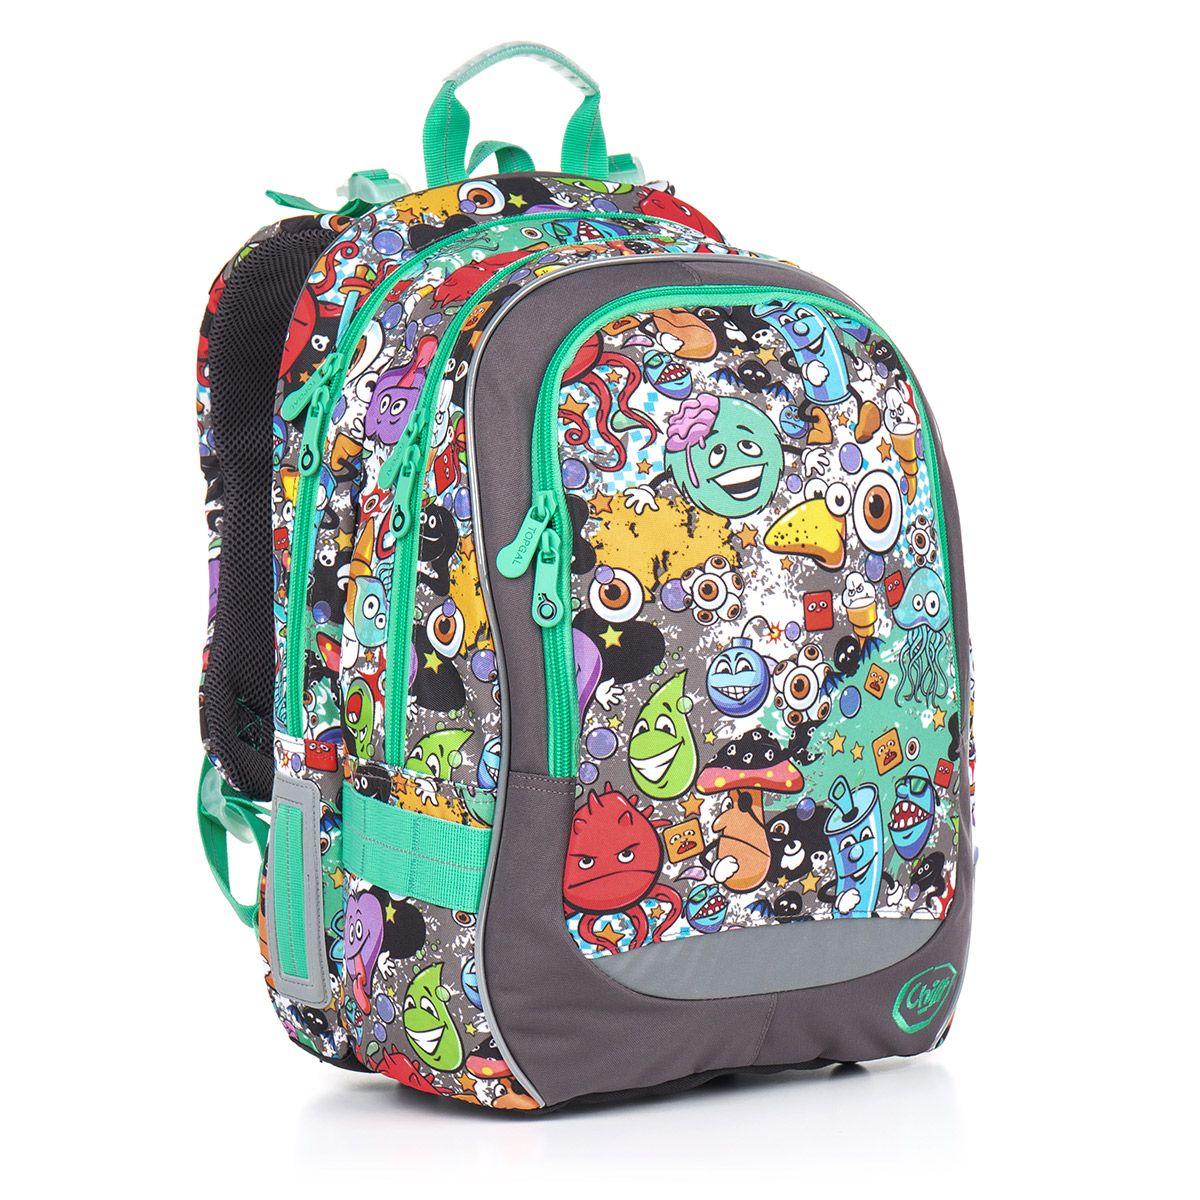 Topgal školní batoh CHI 846 C Grey